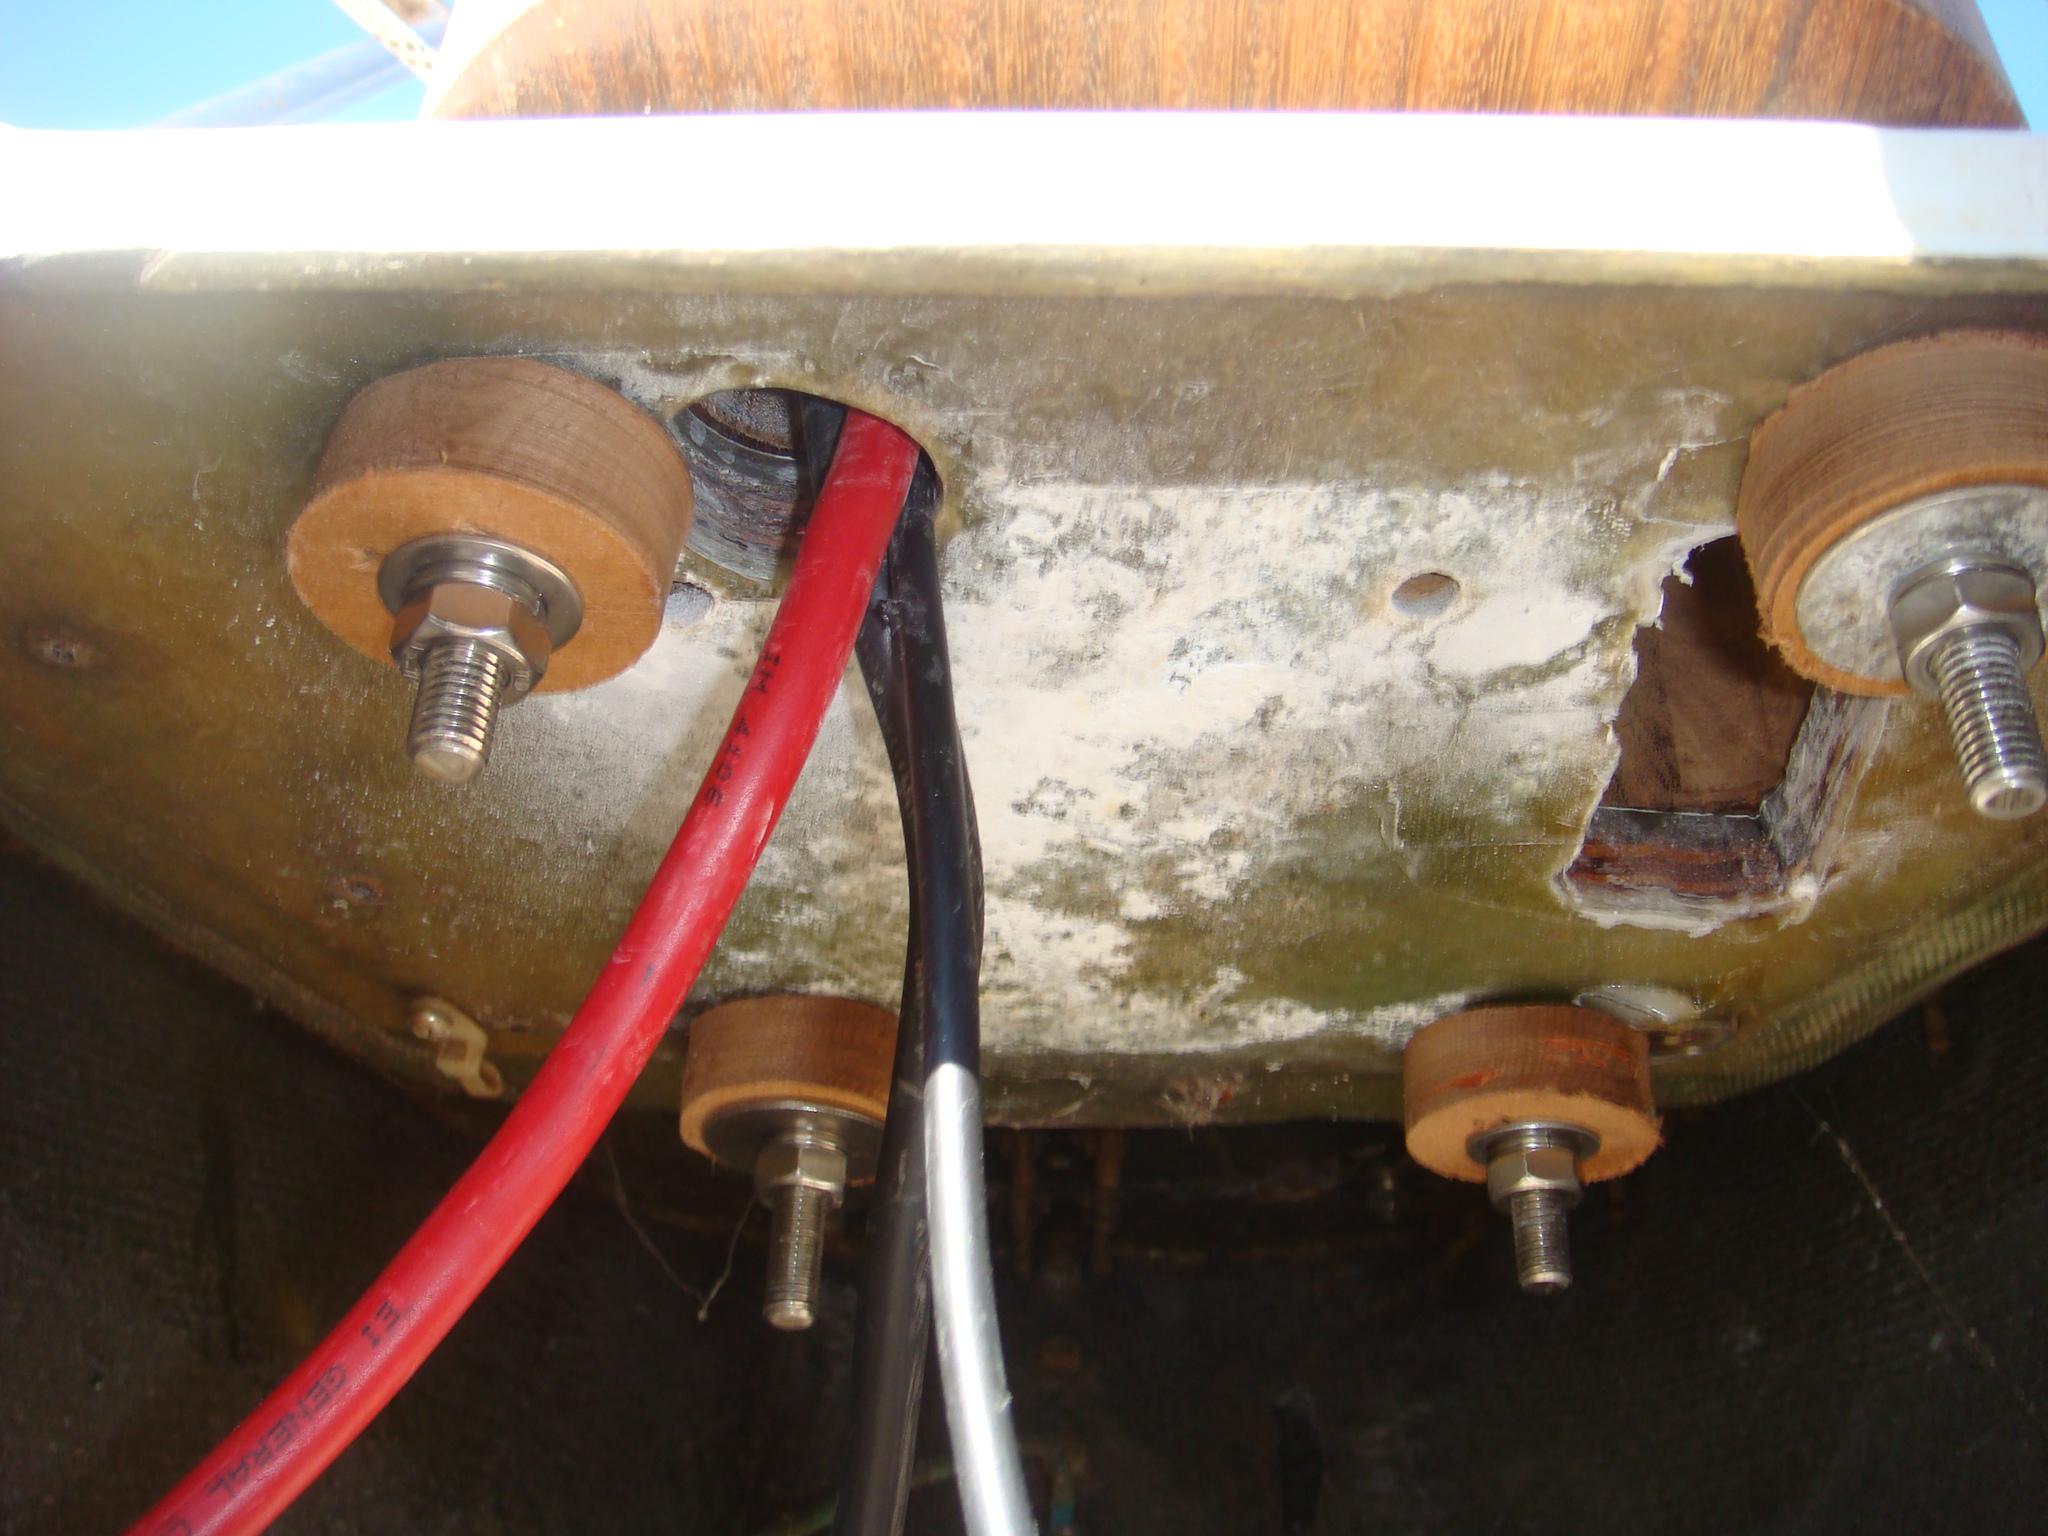 Installing A Quick Windlass Wiring Through Studs Forward Port Stud Re Threaded Into Housing